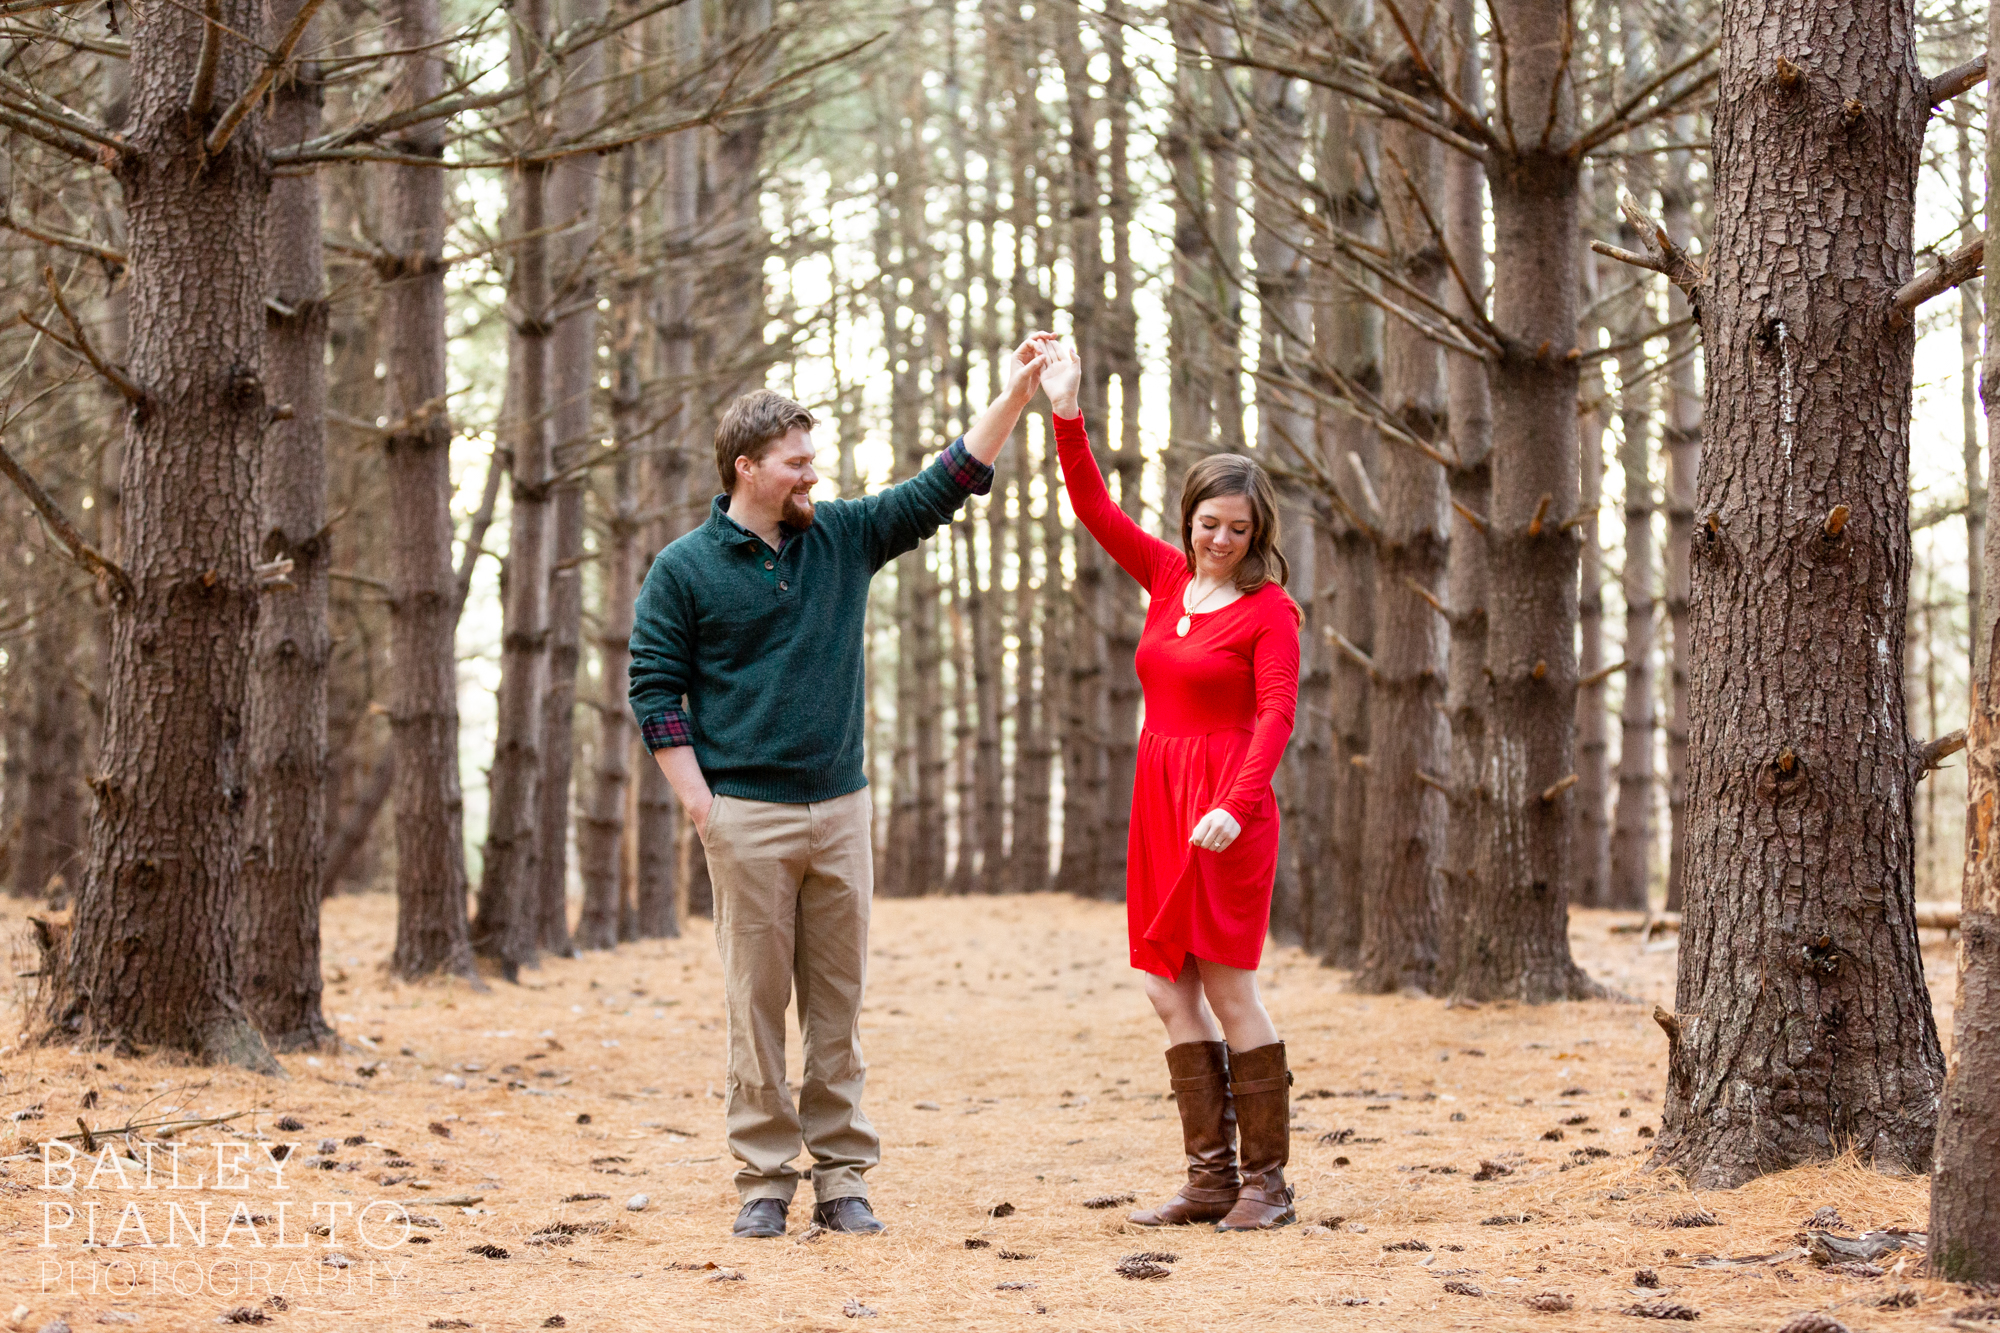 Winter Woods Engagement Session | Kansas City, MO